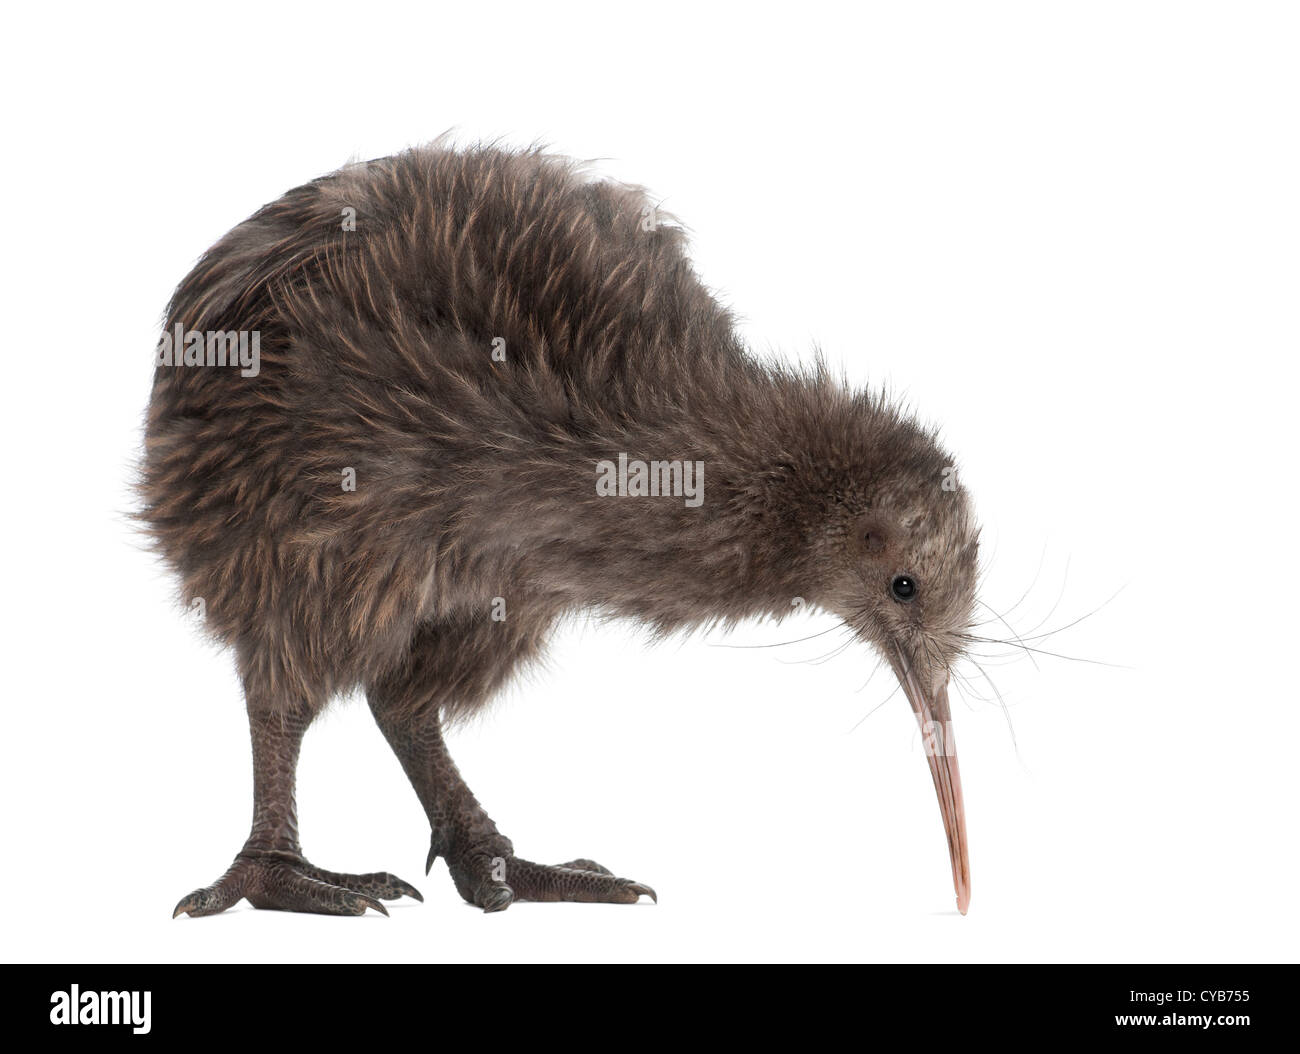 North Island Brown Kiwi, Apteryx mantelli, 5 months old, against white background - Stock Image